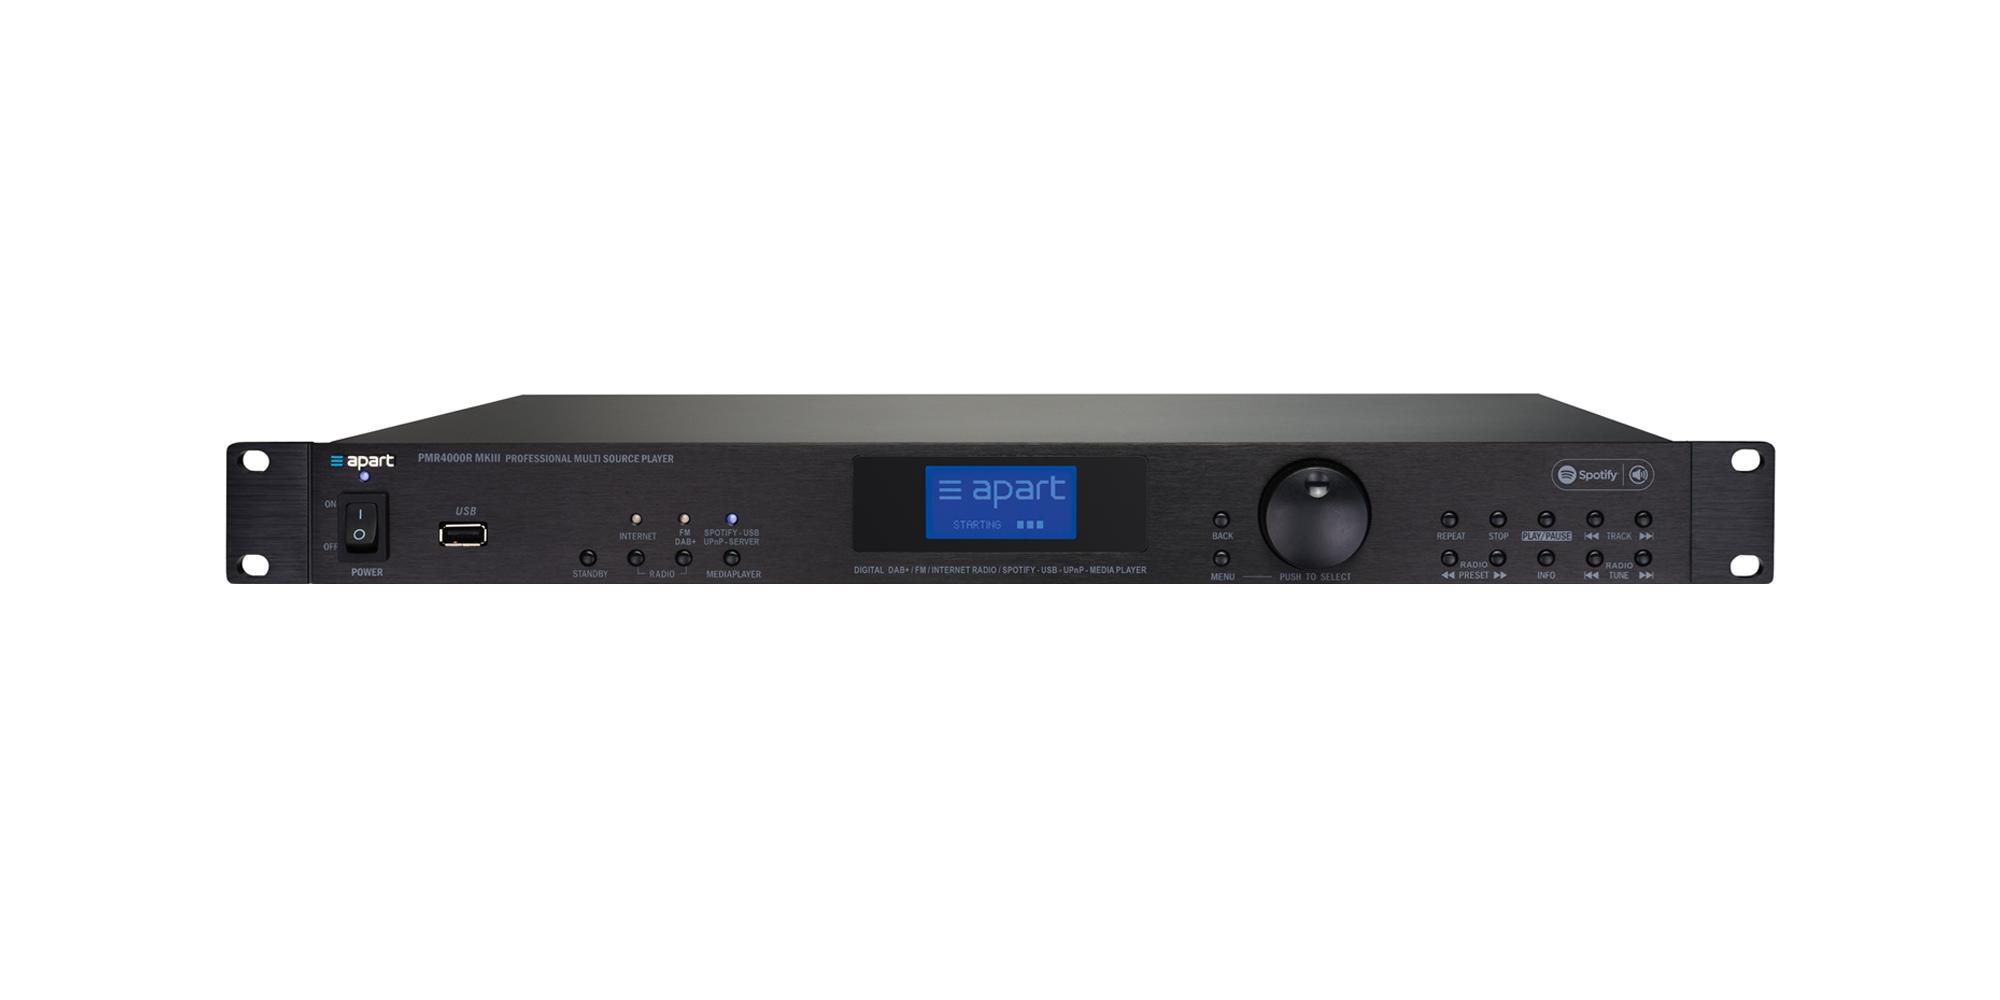 PMR4000RMKIII integrated FM RDS / DAB / DAB+ tuner, internet radio, Spotify Connect, UPnP and USB media player